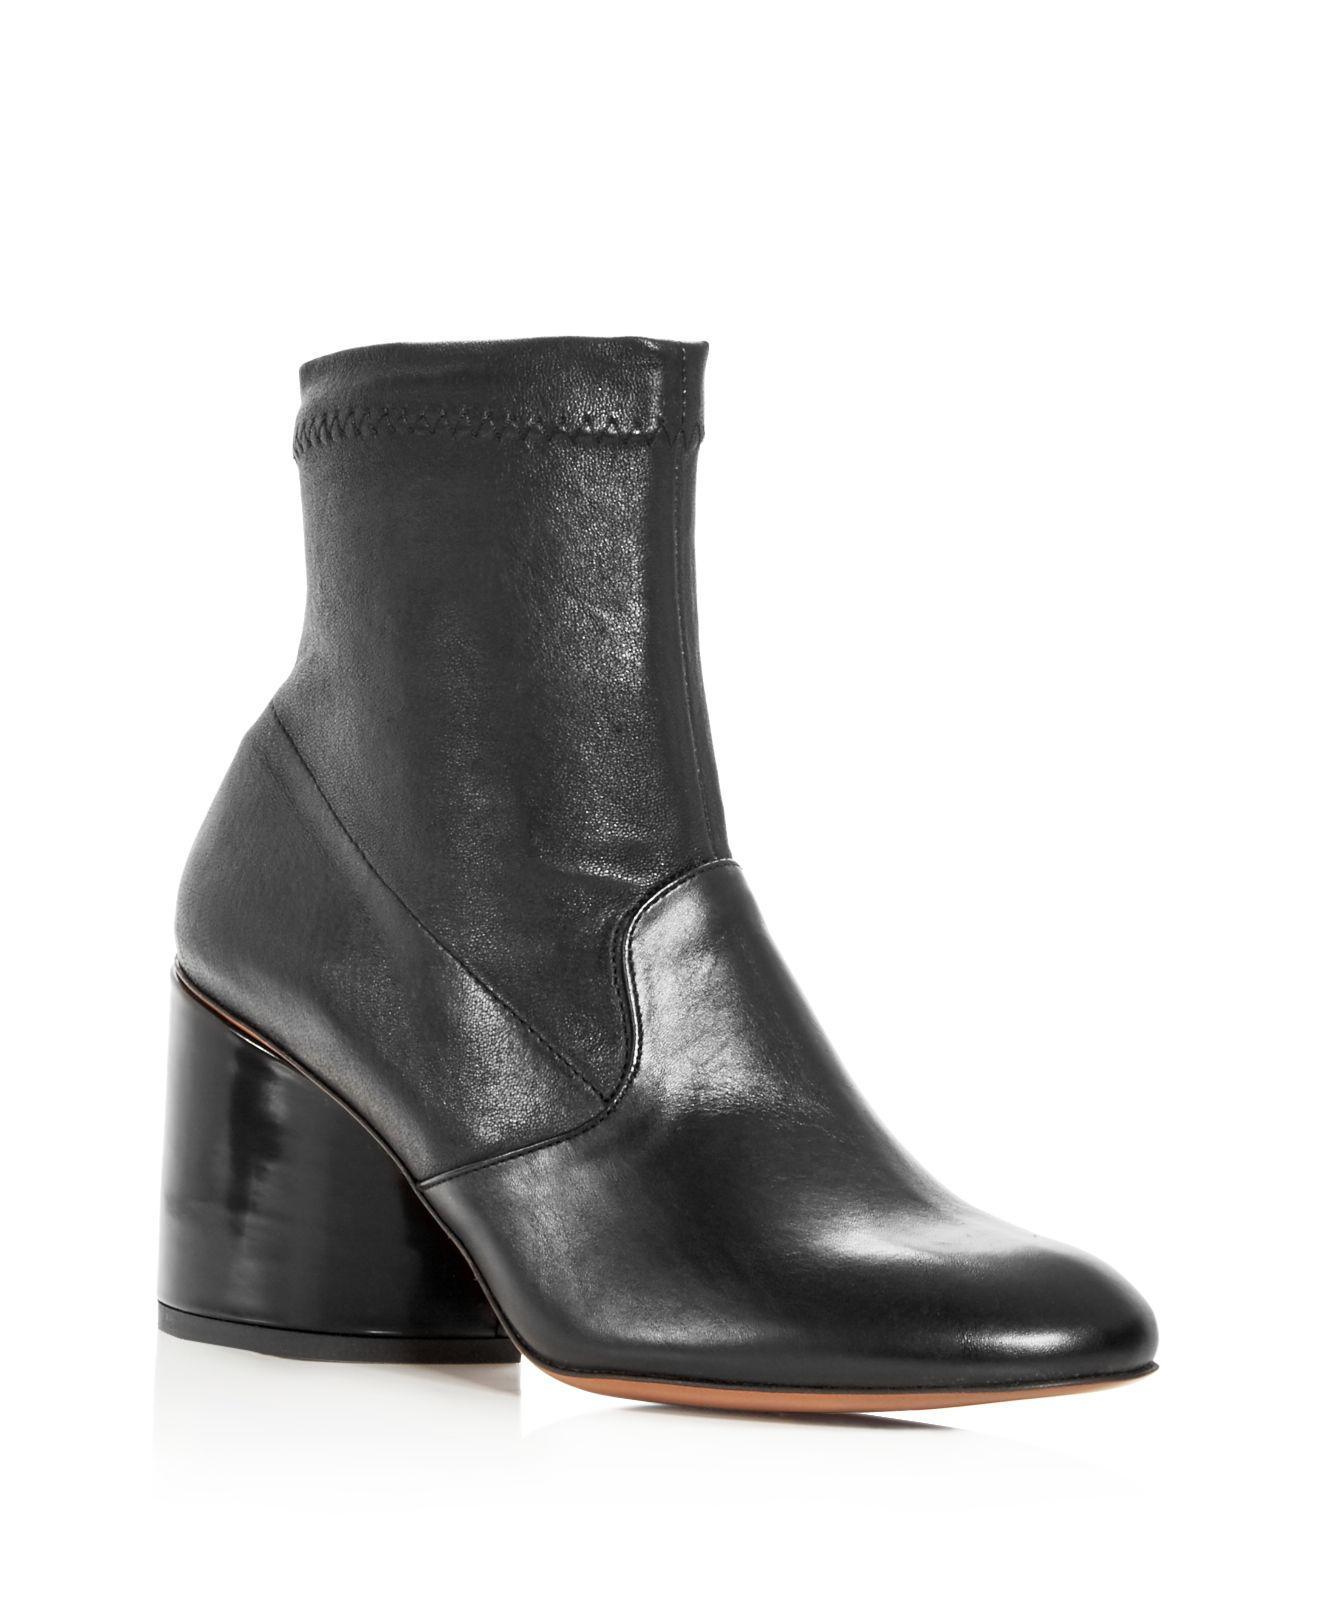 4fc35164a Lyst - Robert Clergerie Women's Koss Leather Block Heel Booties in Black